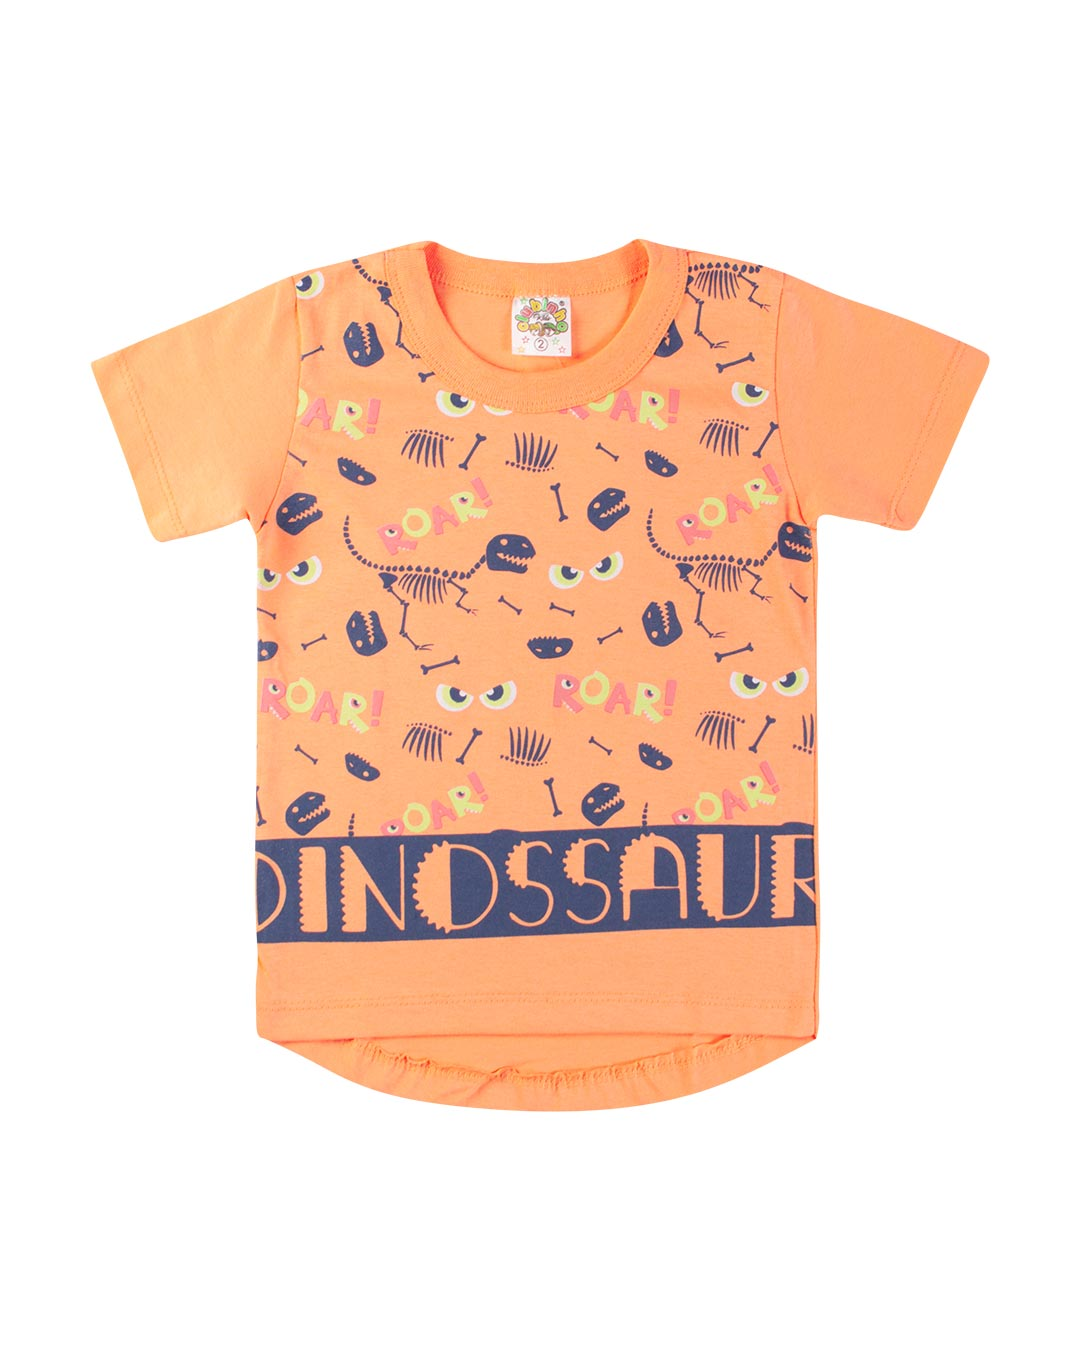 Camiseta Infantil Roar - Clubinho